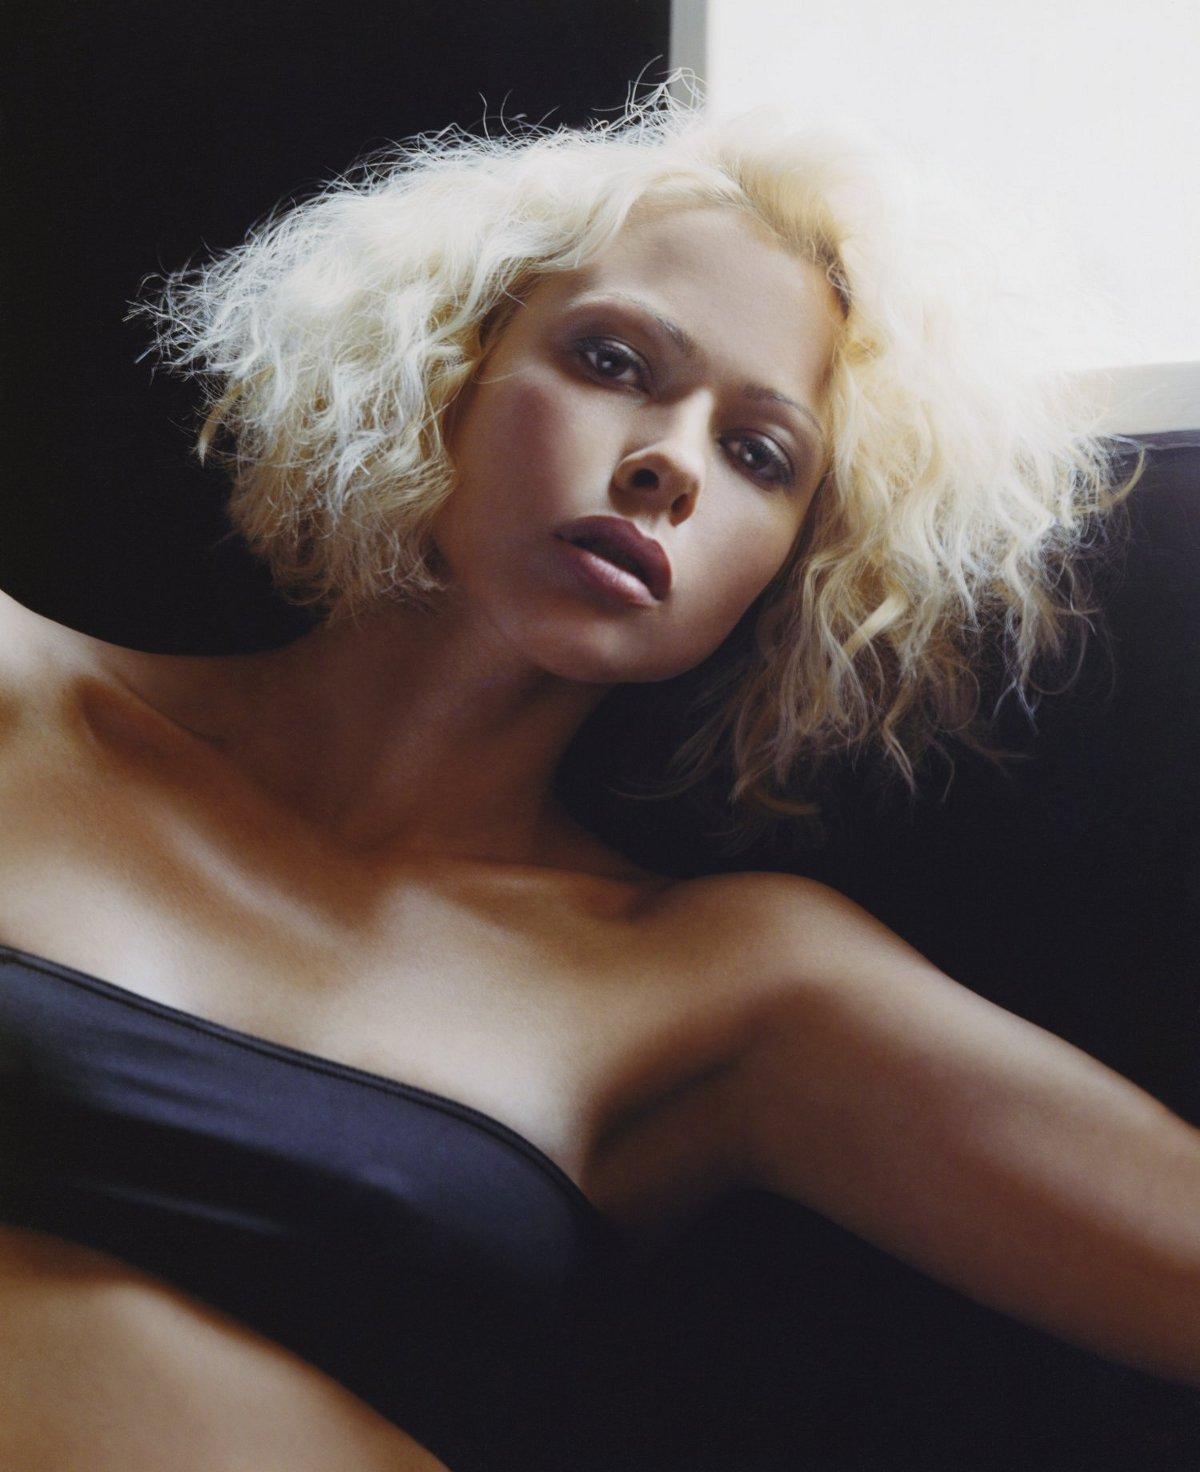 Jirina Petrovicka picture